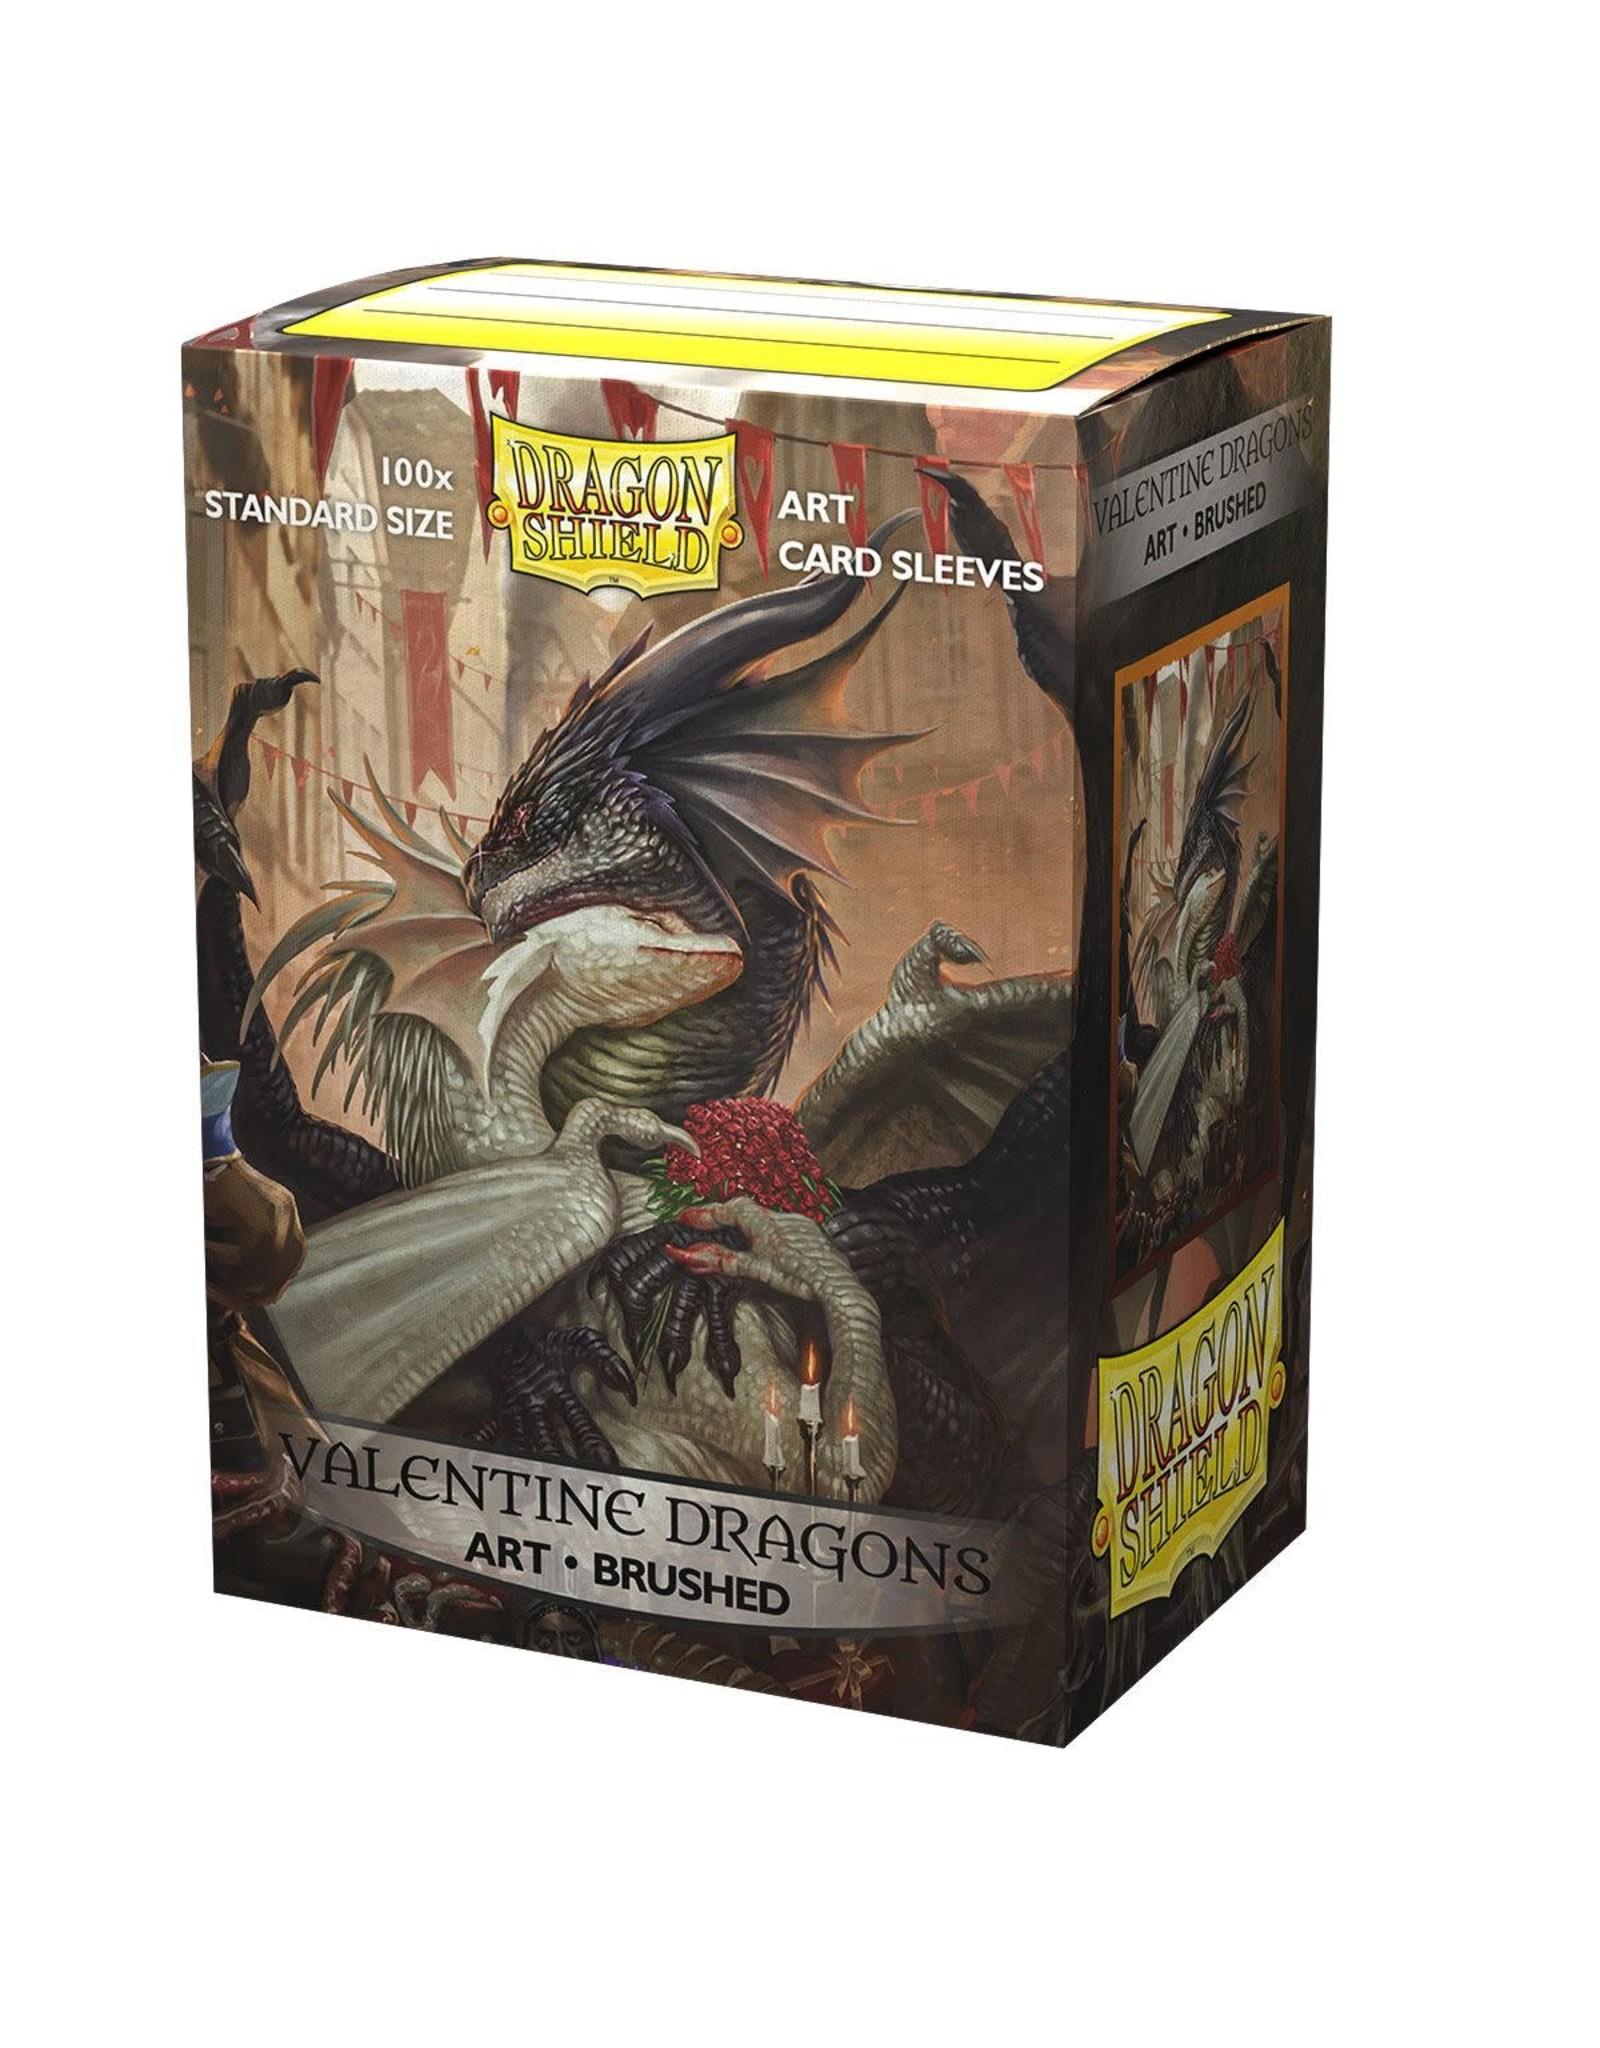 Arcane Tinmen Dragon Shield Valentine Dragons 2021' Art Sleeves Brushed 100 Standard